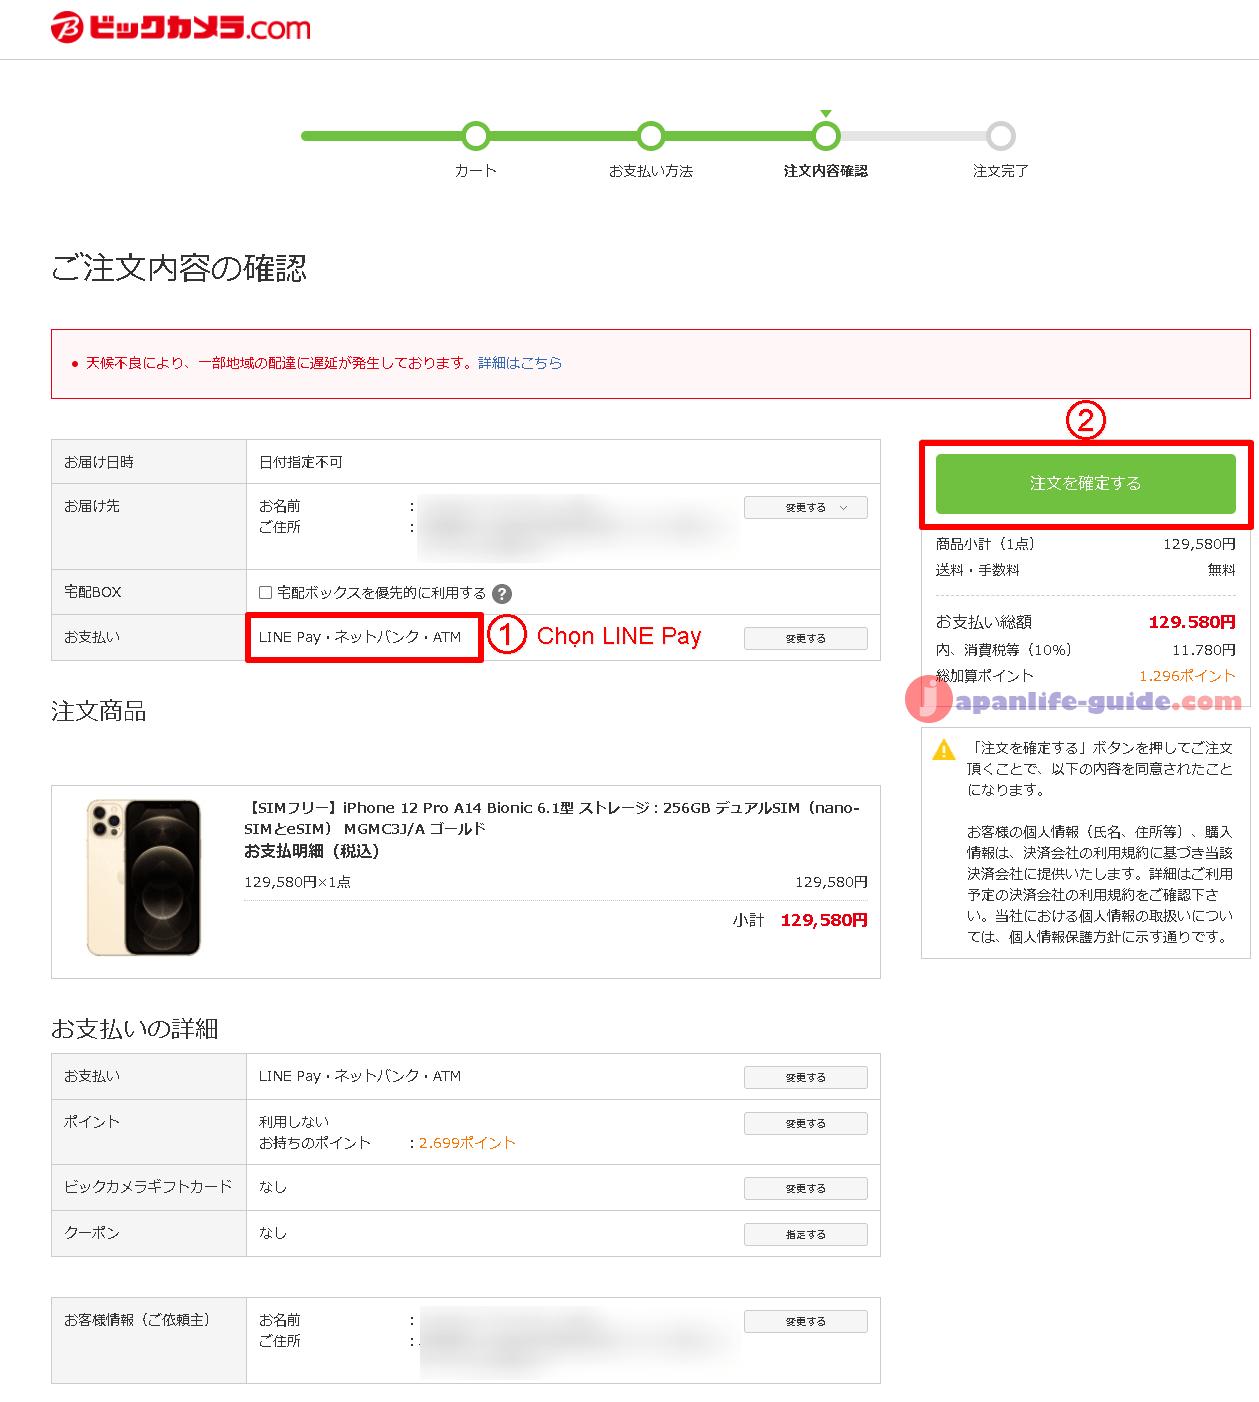 mua điện thoại ở bic camera